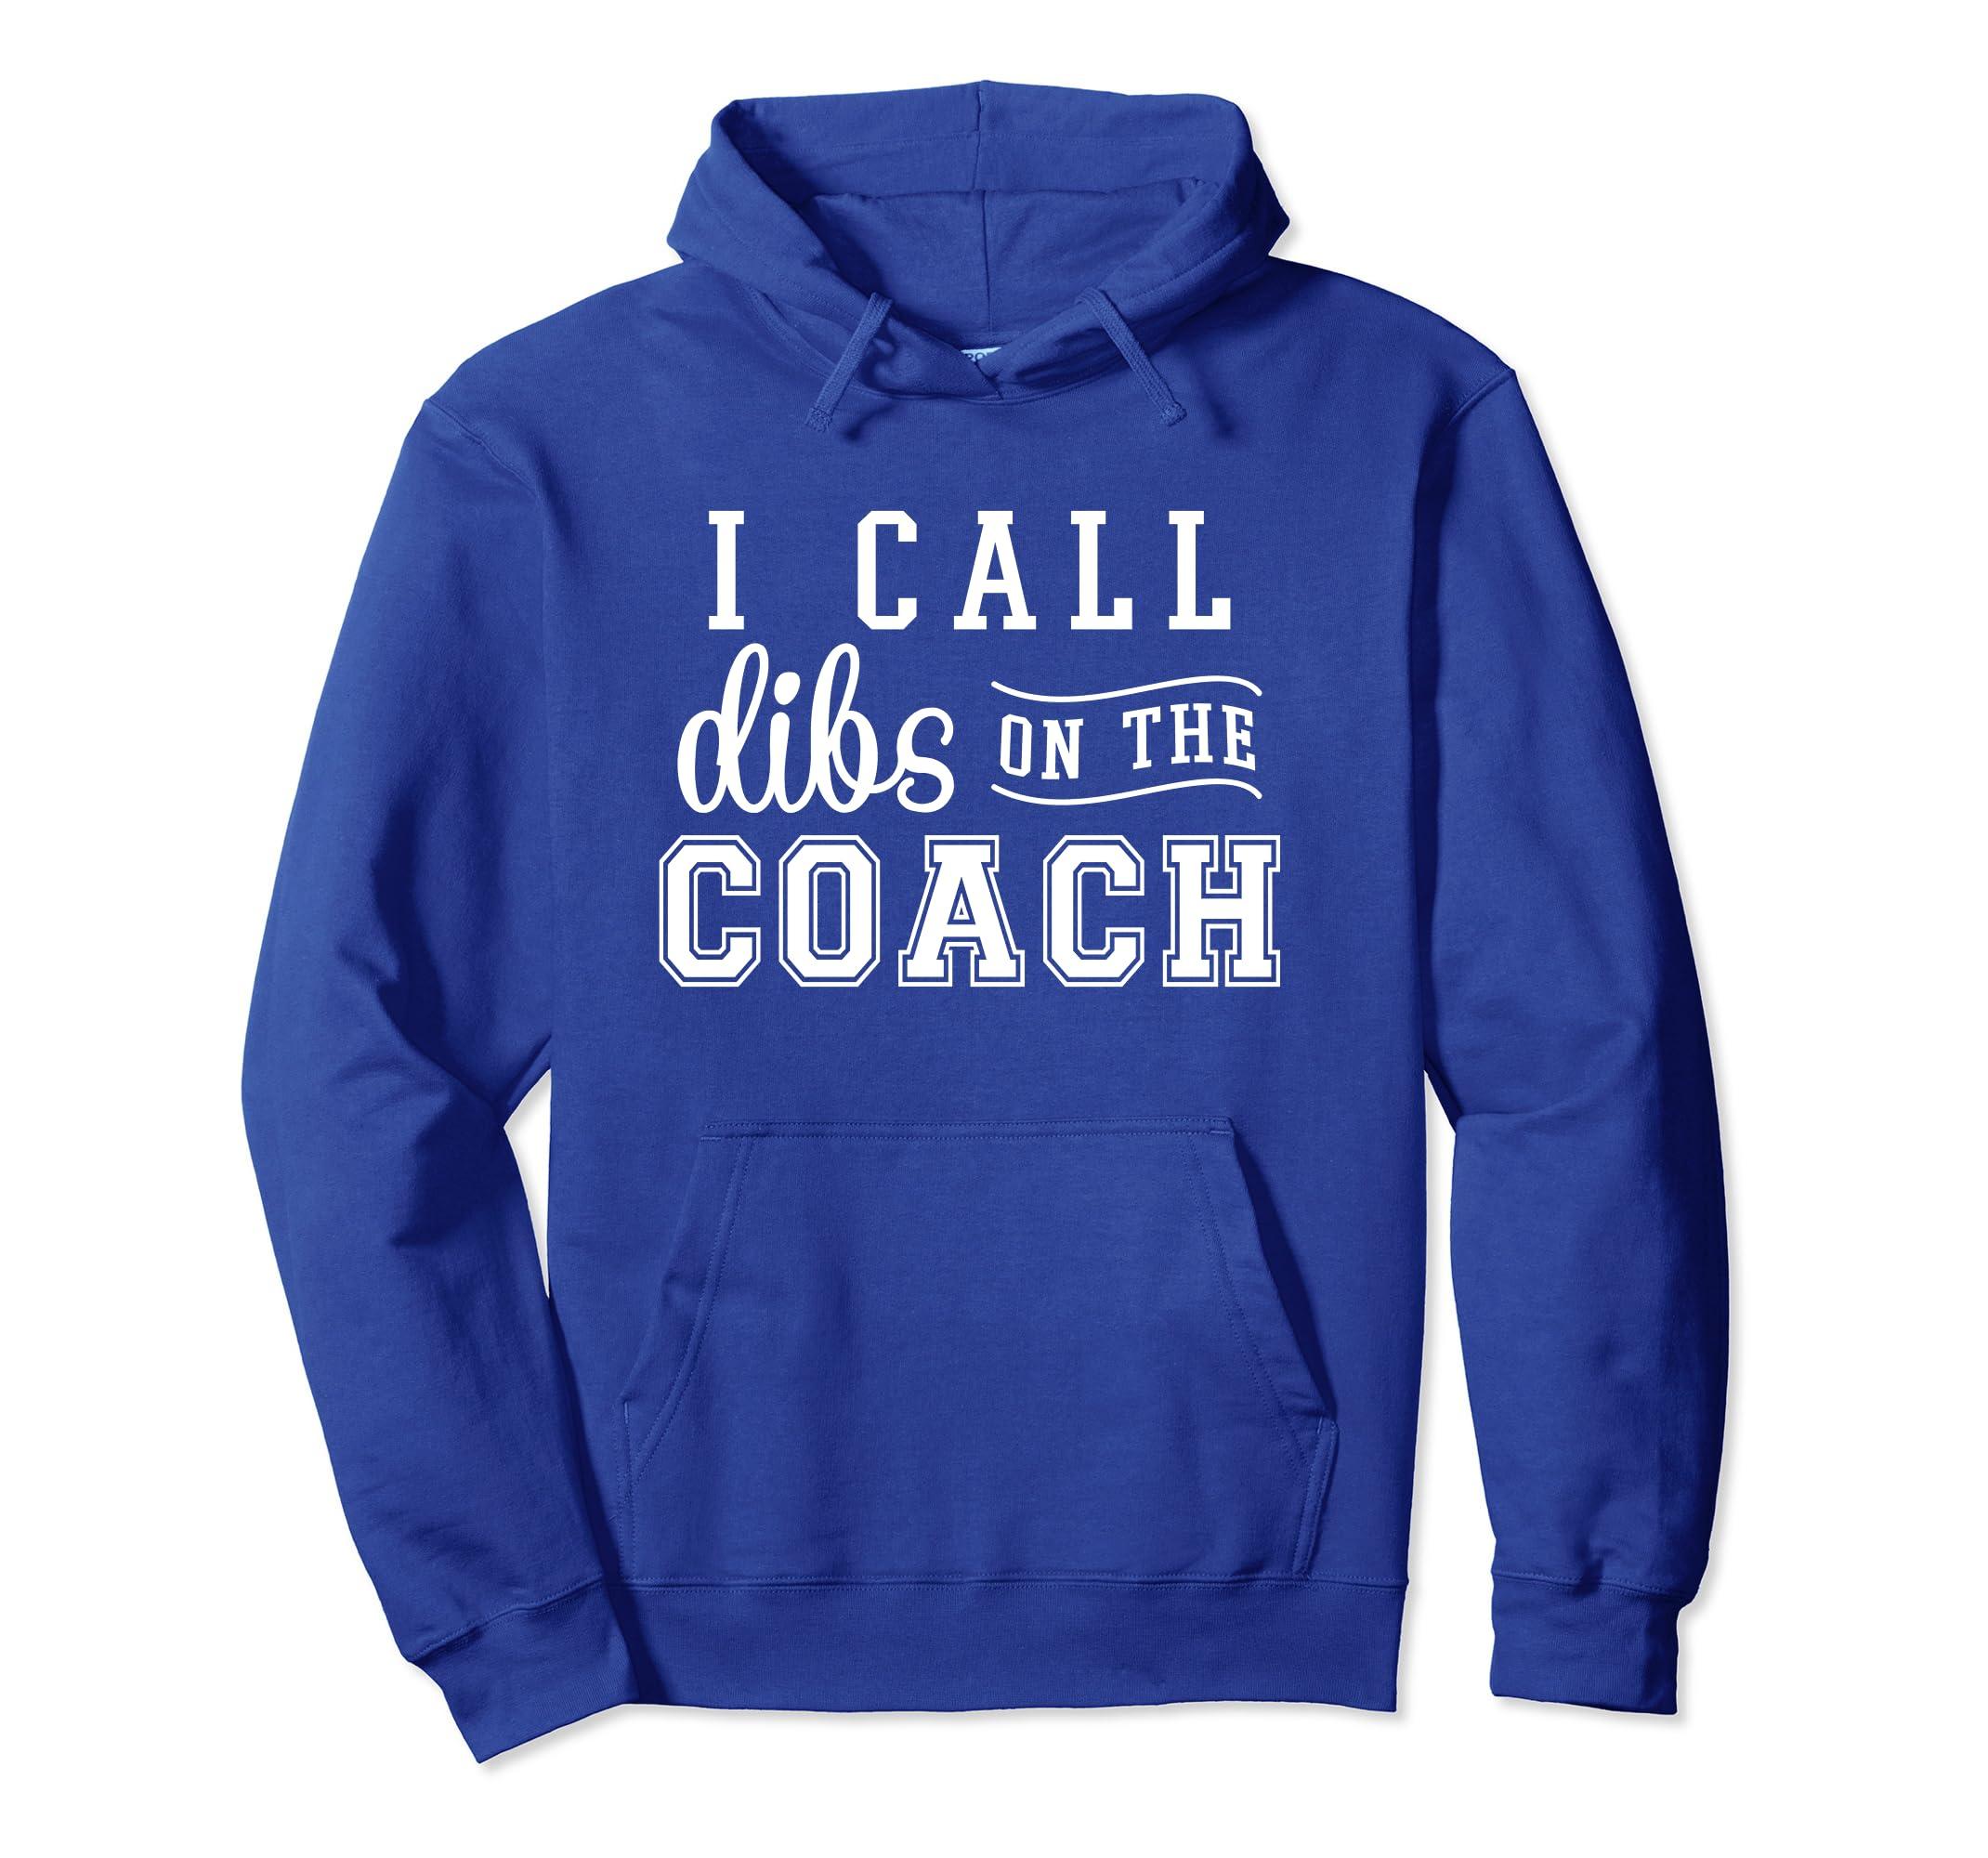 I call dibs on the Coach Sweater Coachs Wife Hoodie-SFL